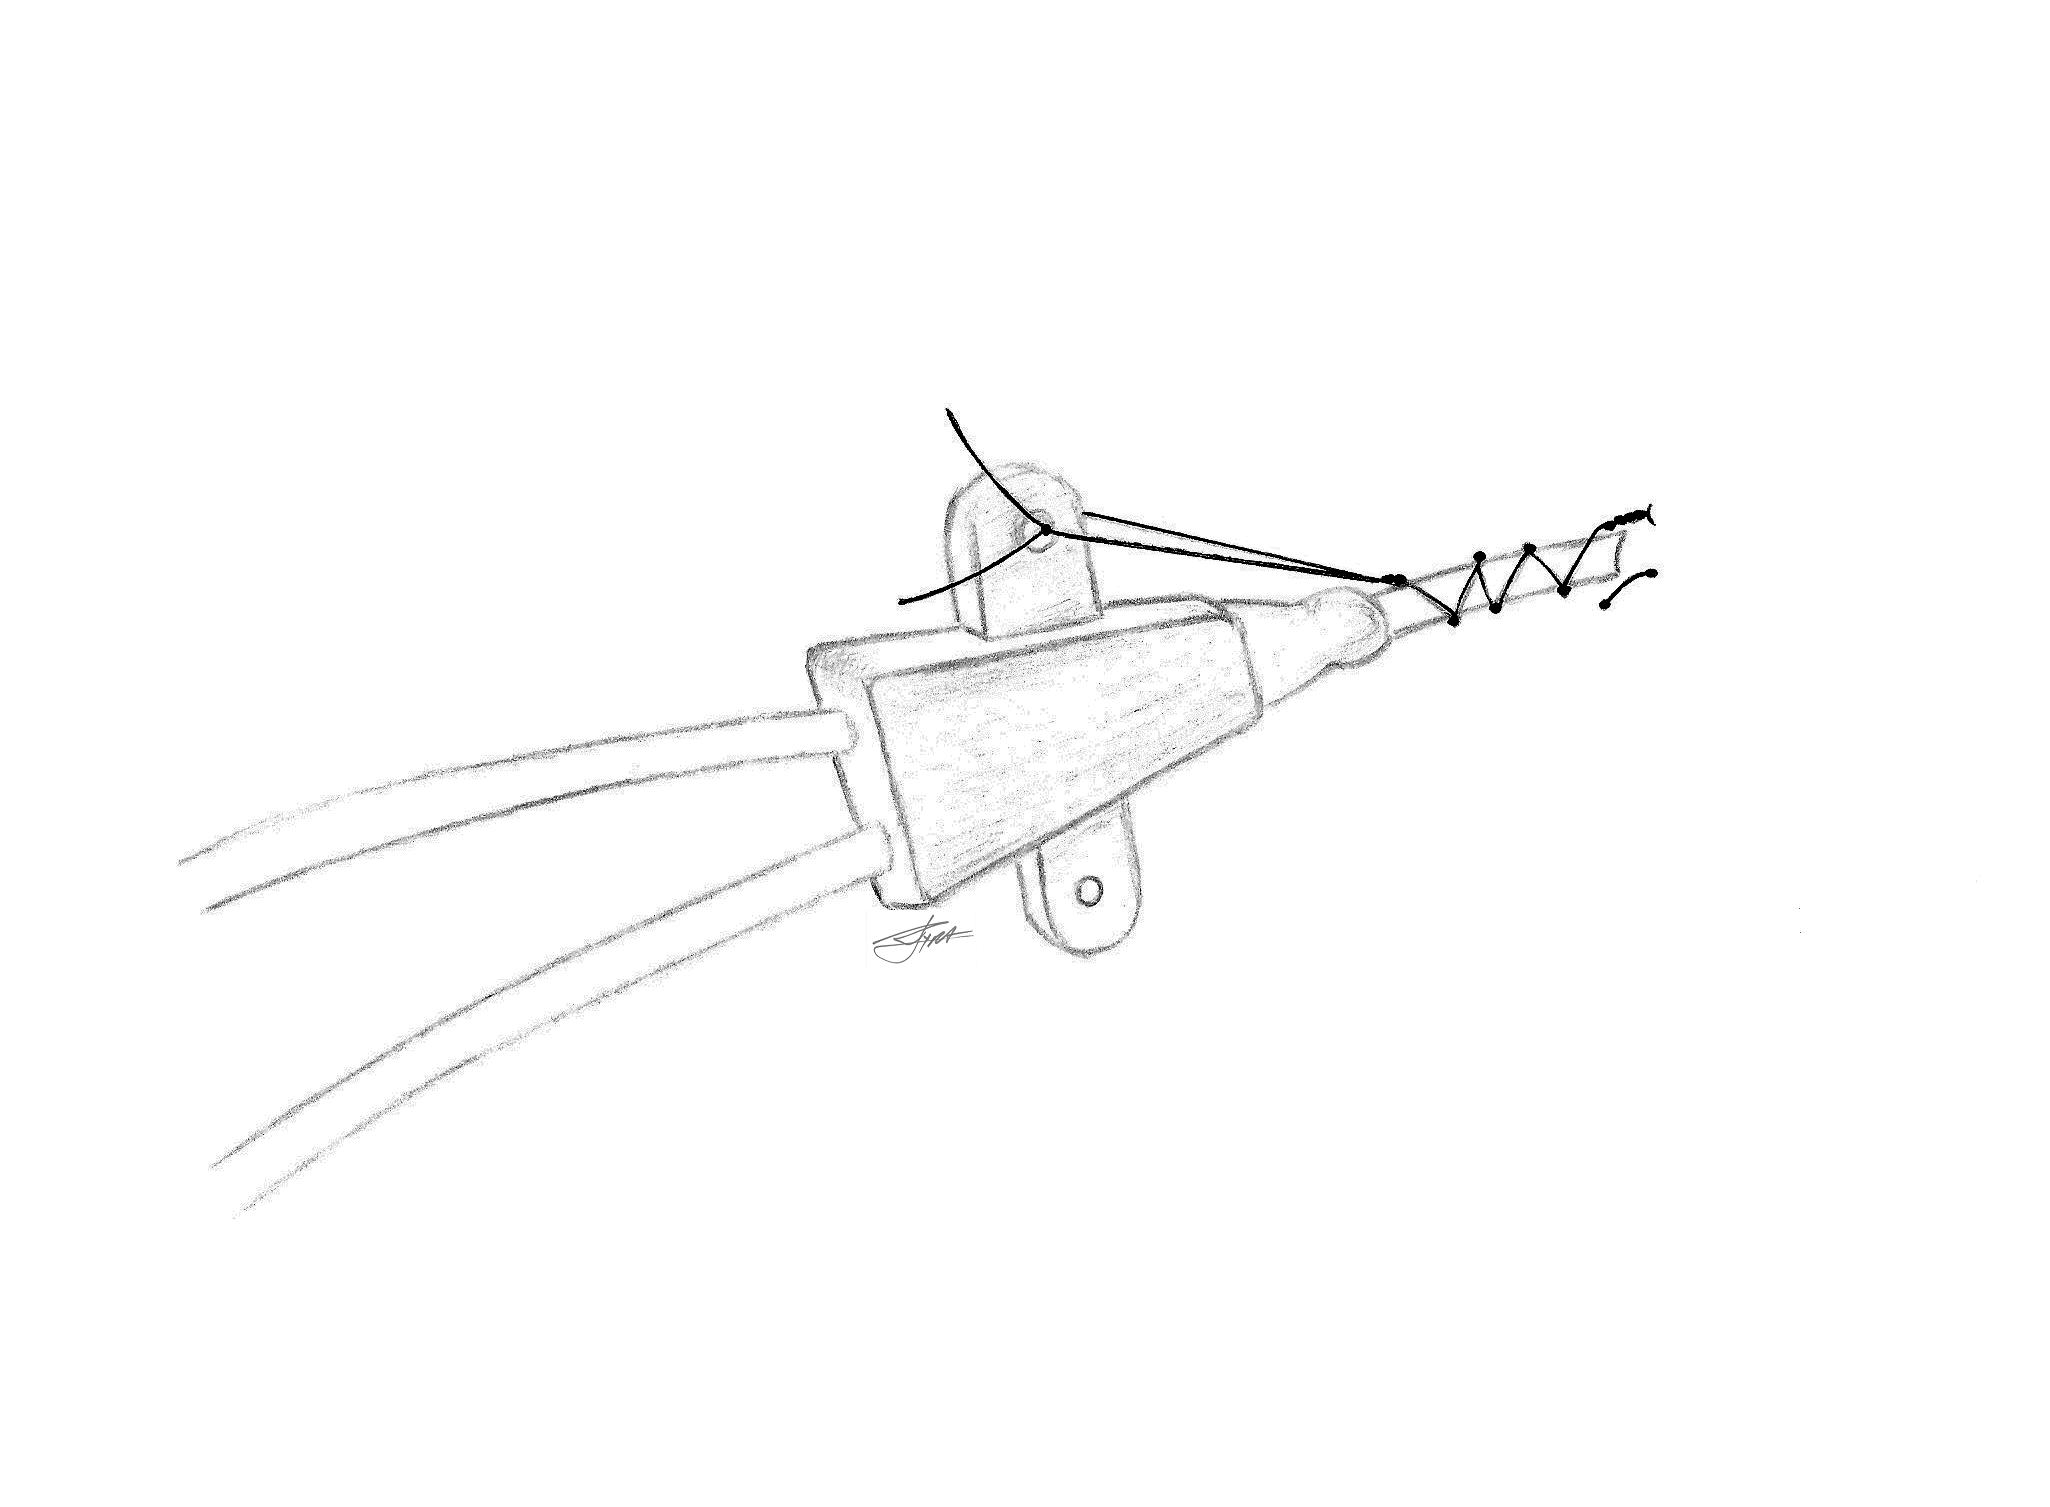 file a technique for the fixation of central venous catheters Nosgoth Skins file a technique for the fixation of central venous catheters